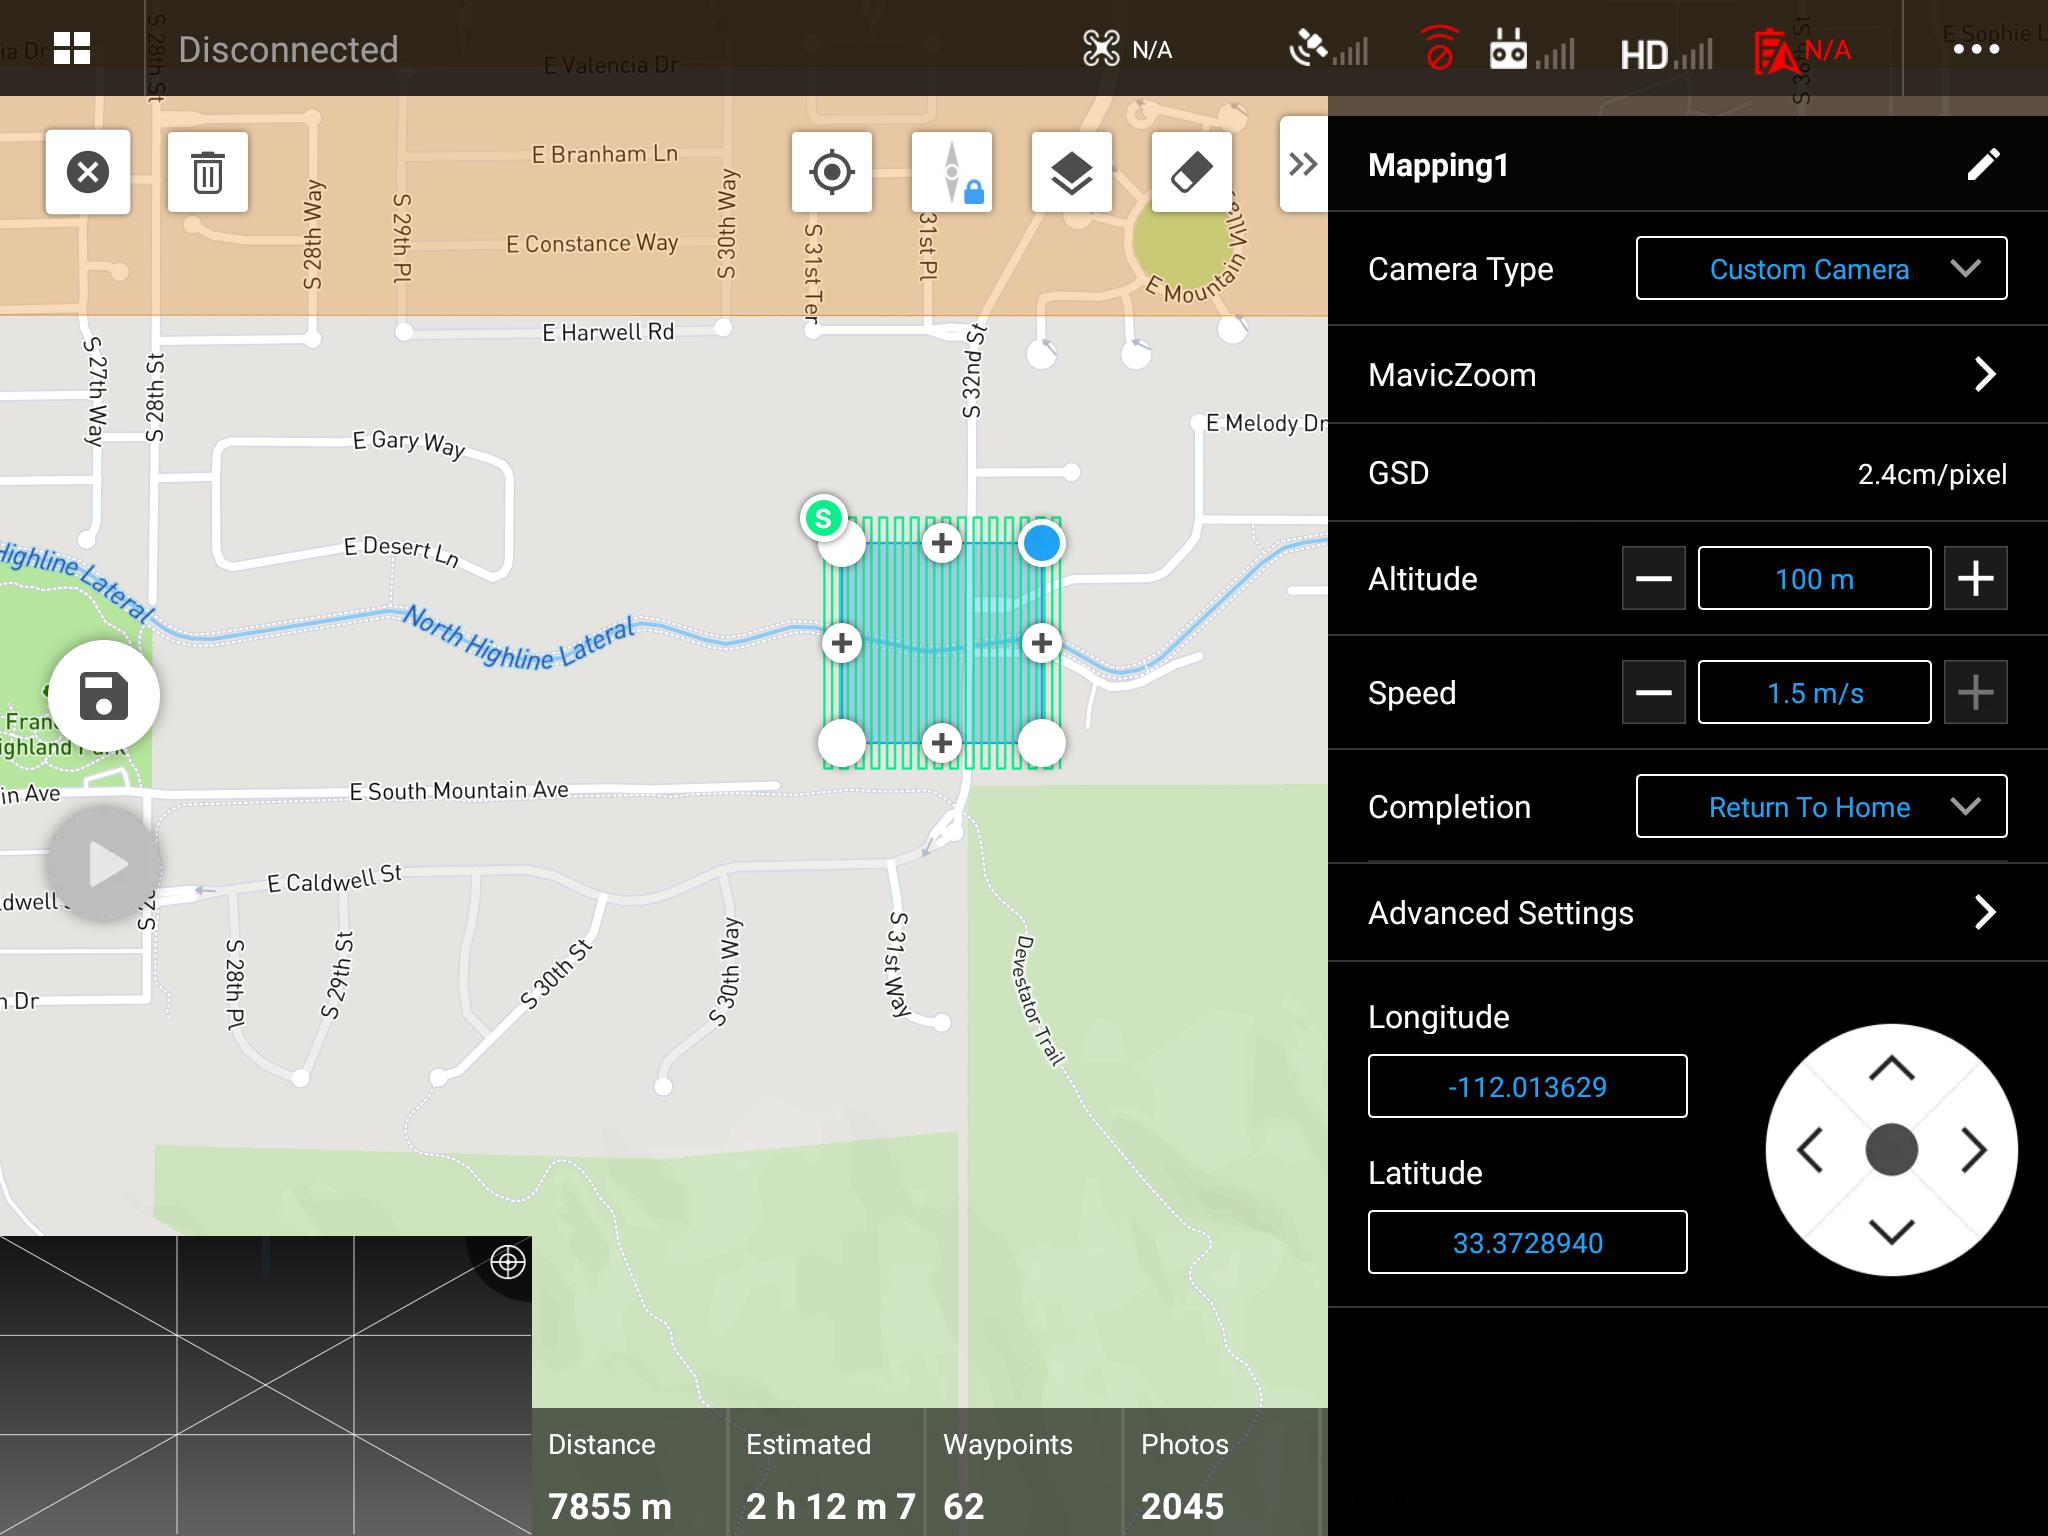 DJI Pilot Mapping Mission test on Mavic V2 Zoom | DJI FORUM